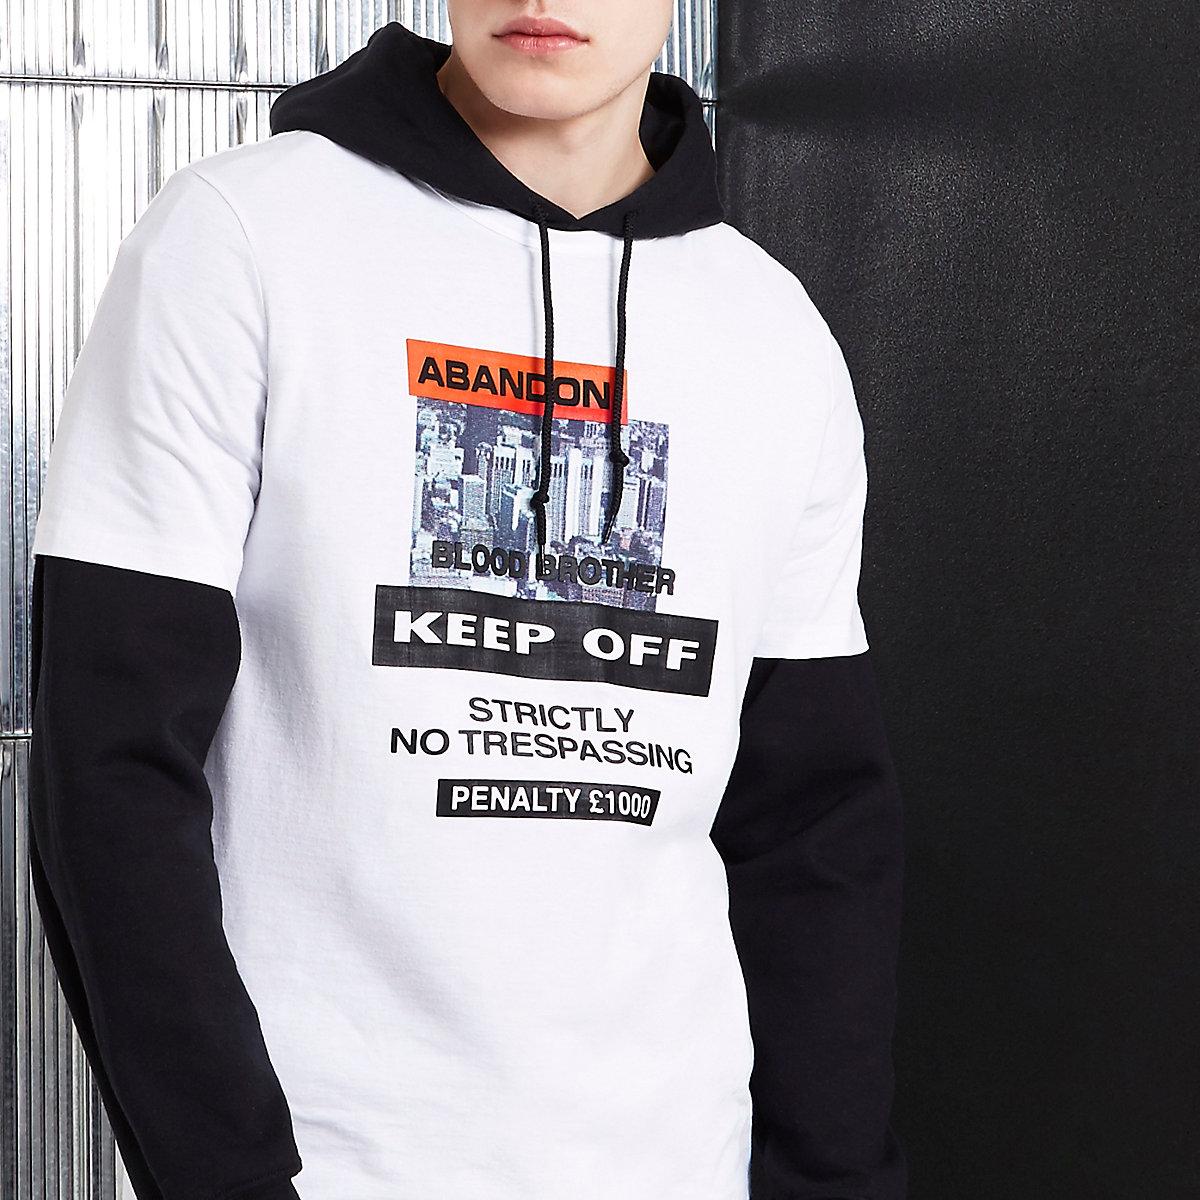 White Blood Brother 'abandon' print T-shirt